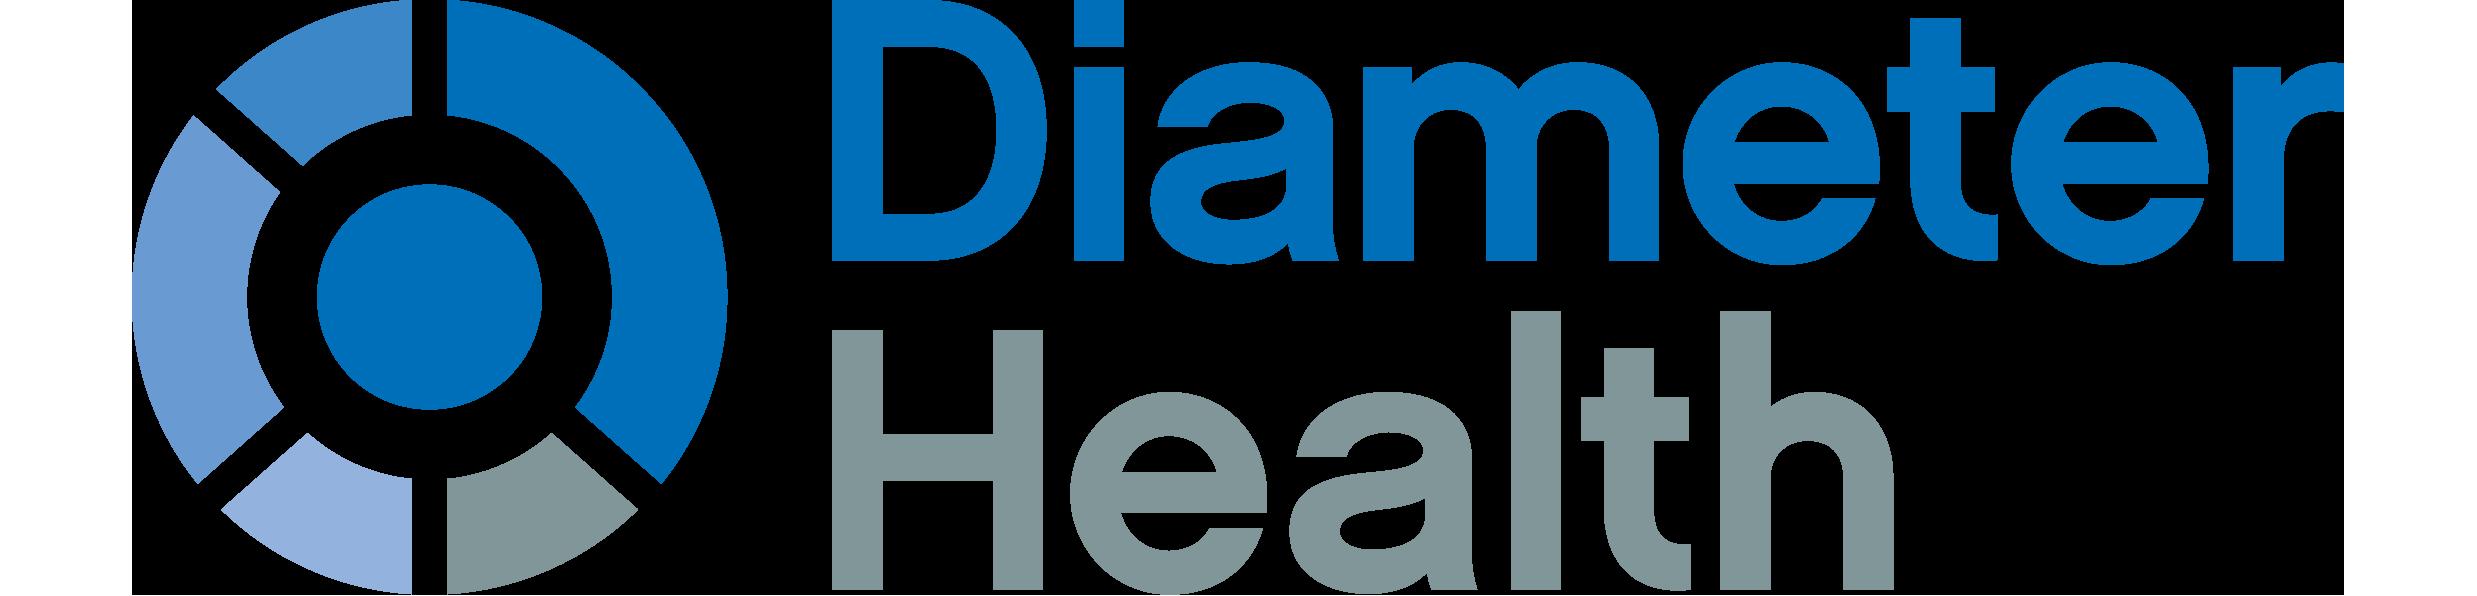 Diameter-Health-logo